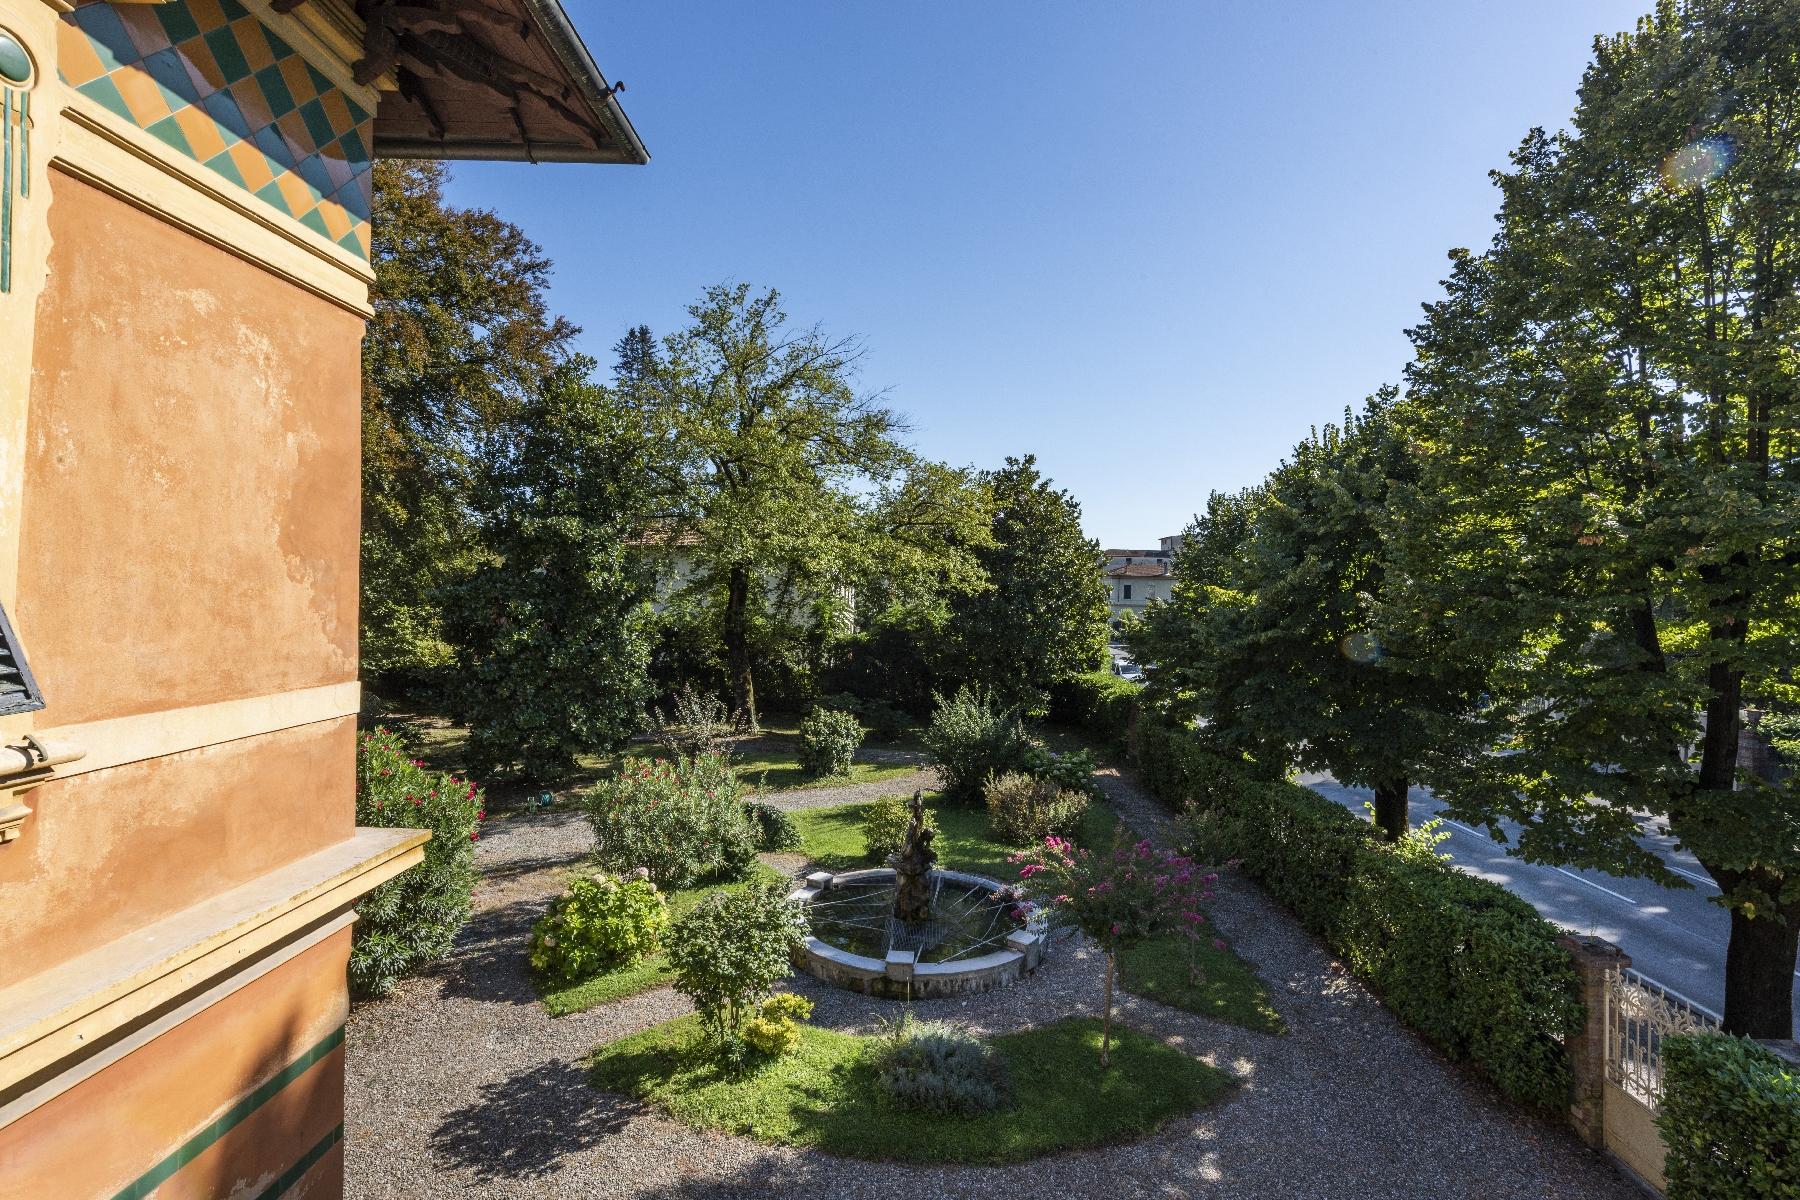 Villa in Vendita a Lucca: 5 locali, 660 mq - Foto 19